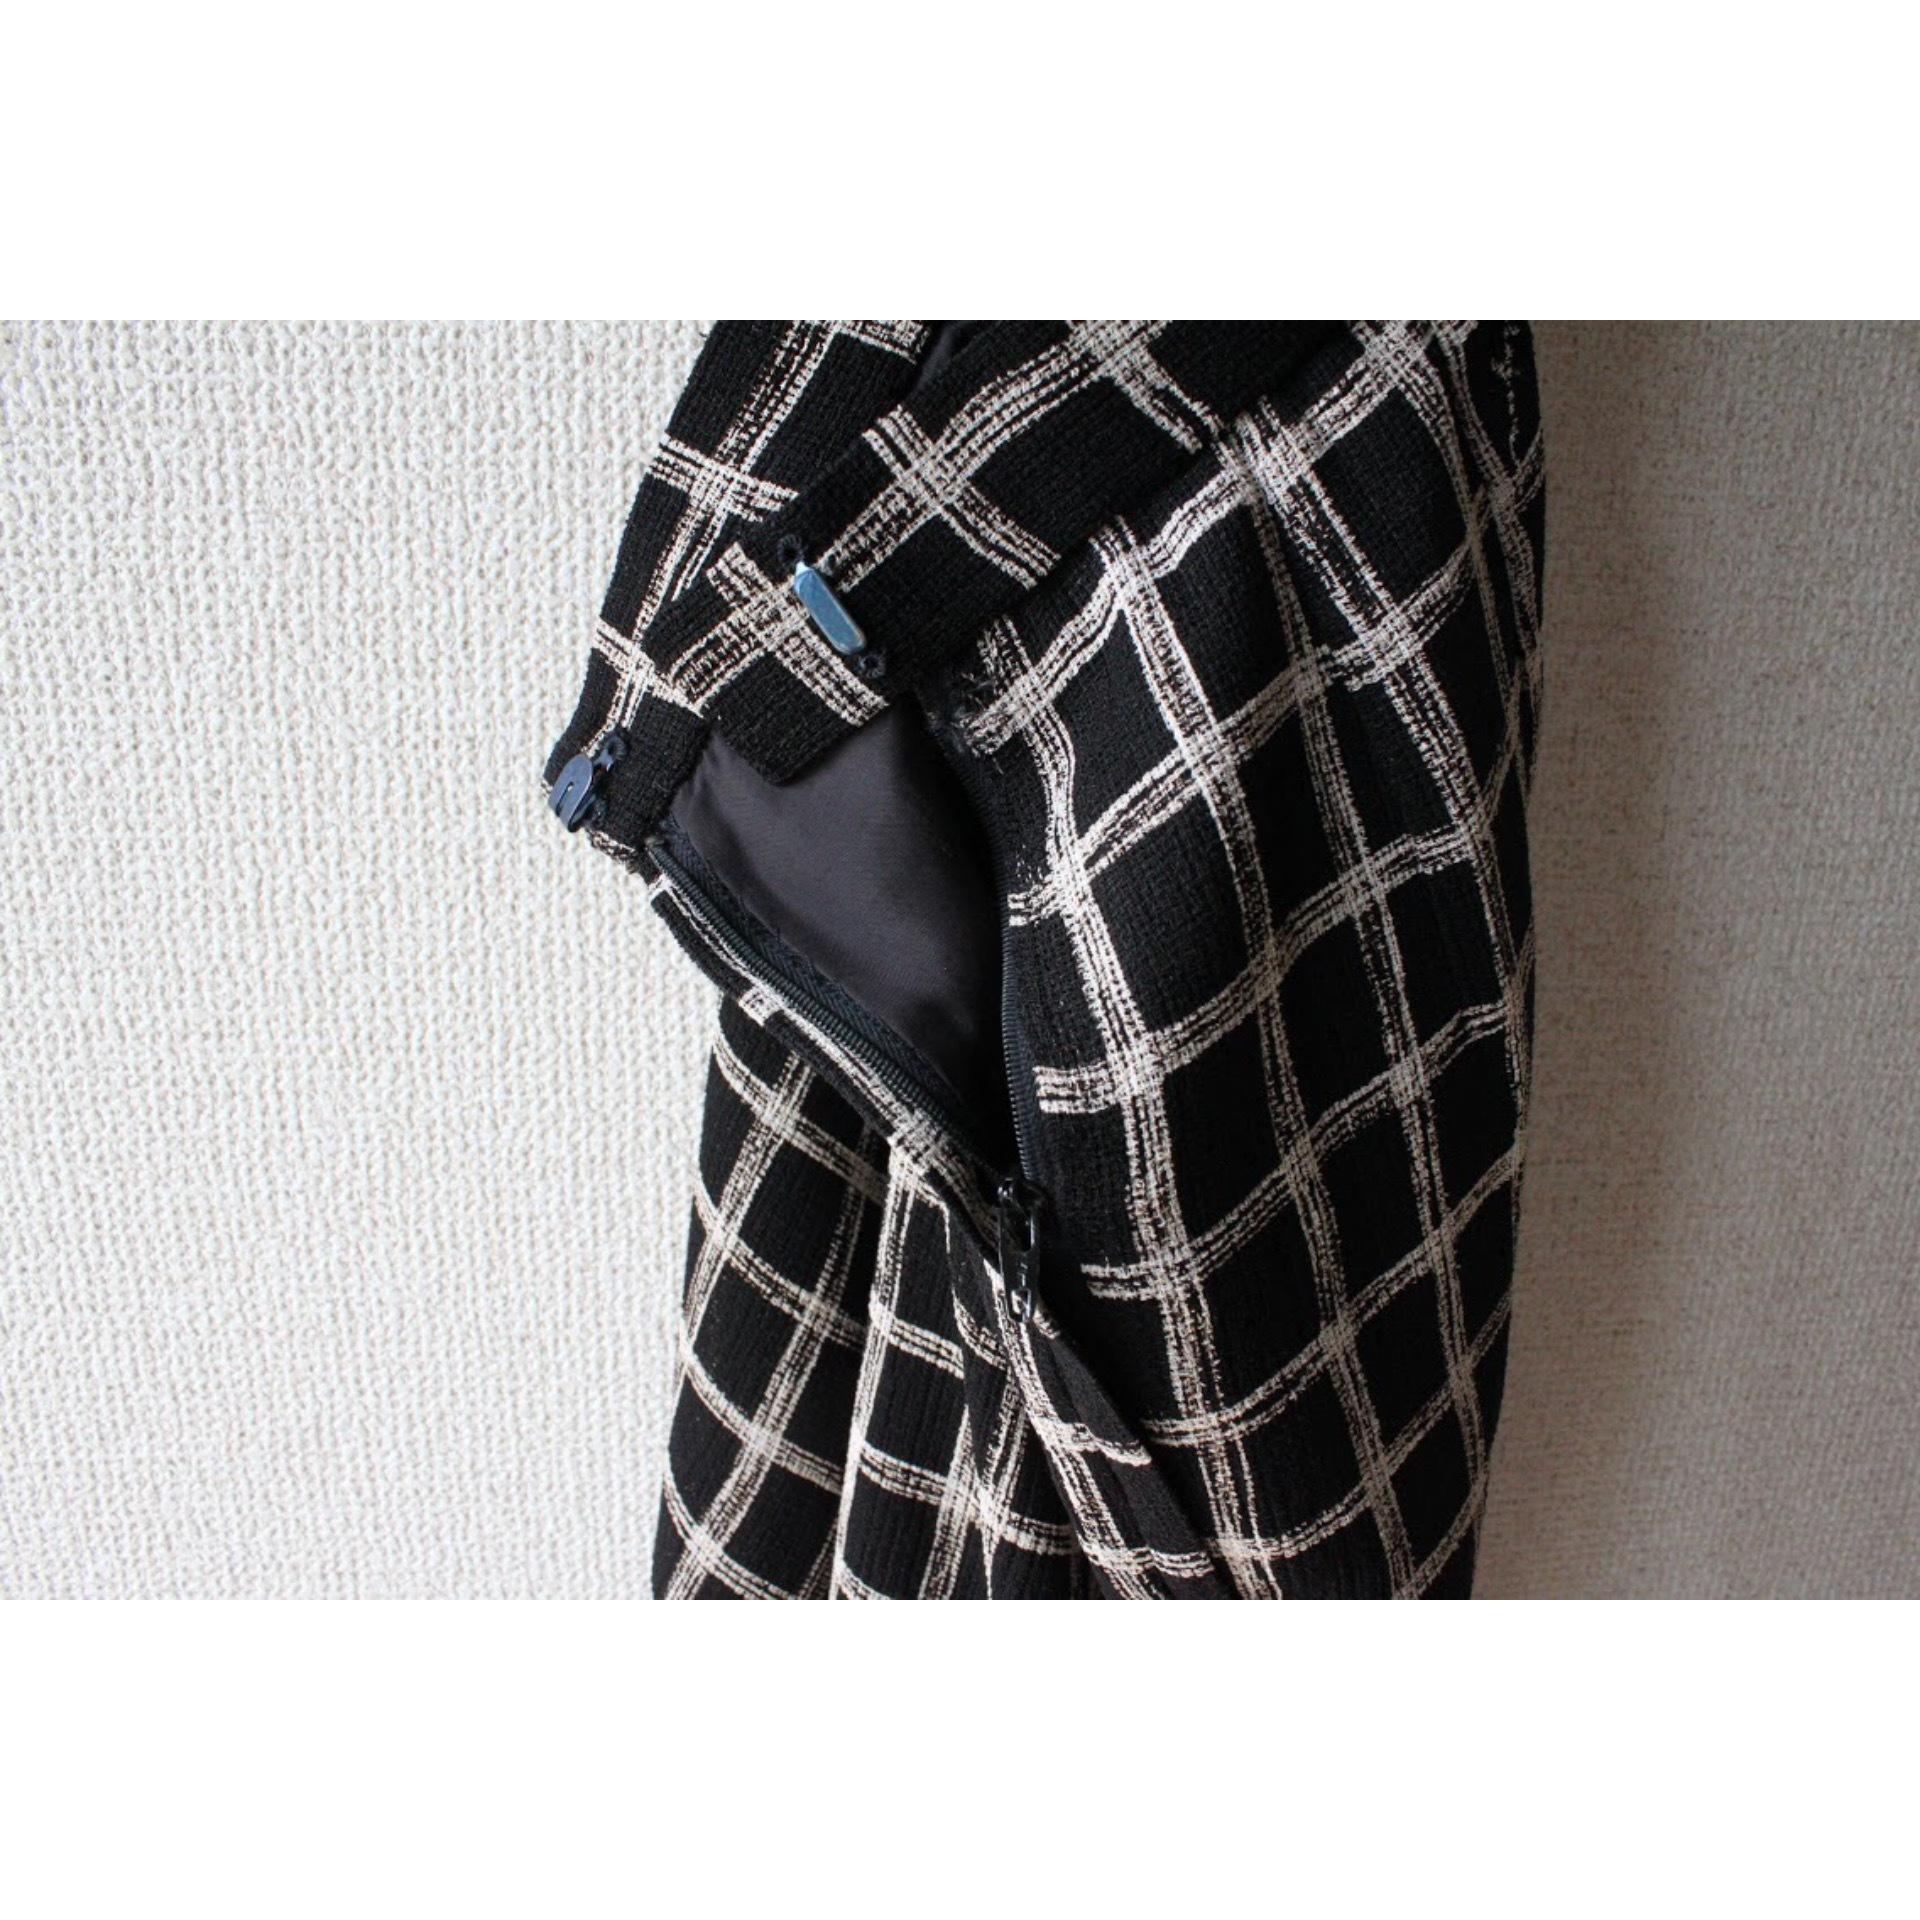 Vintage monotone check pants